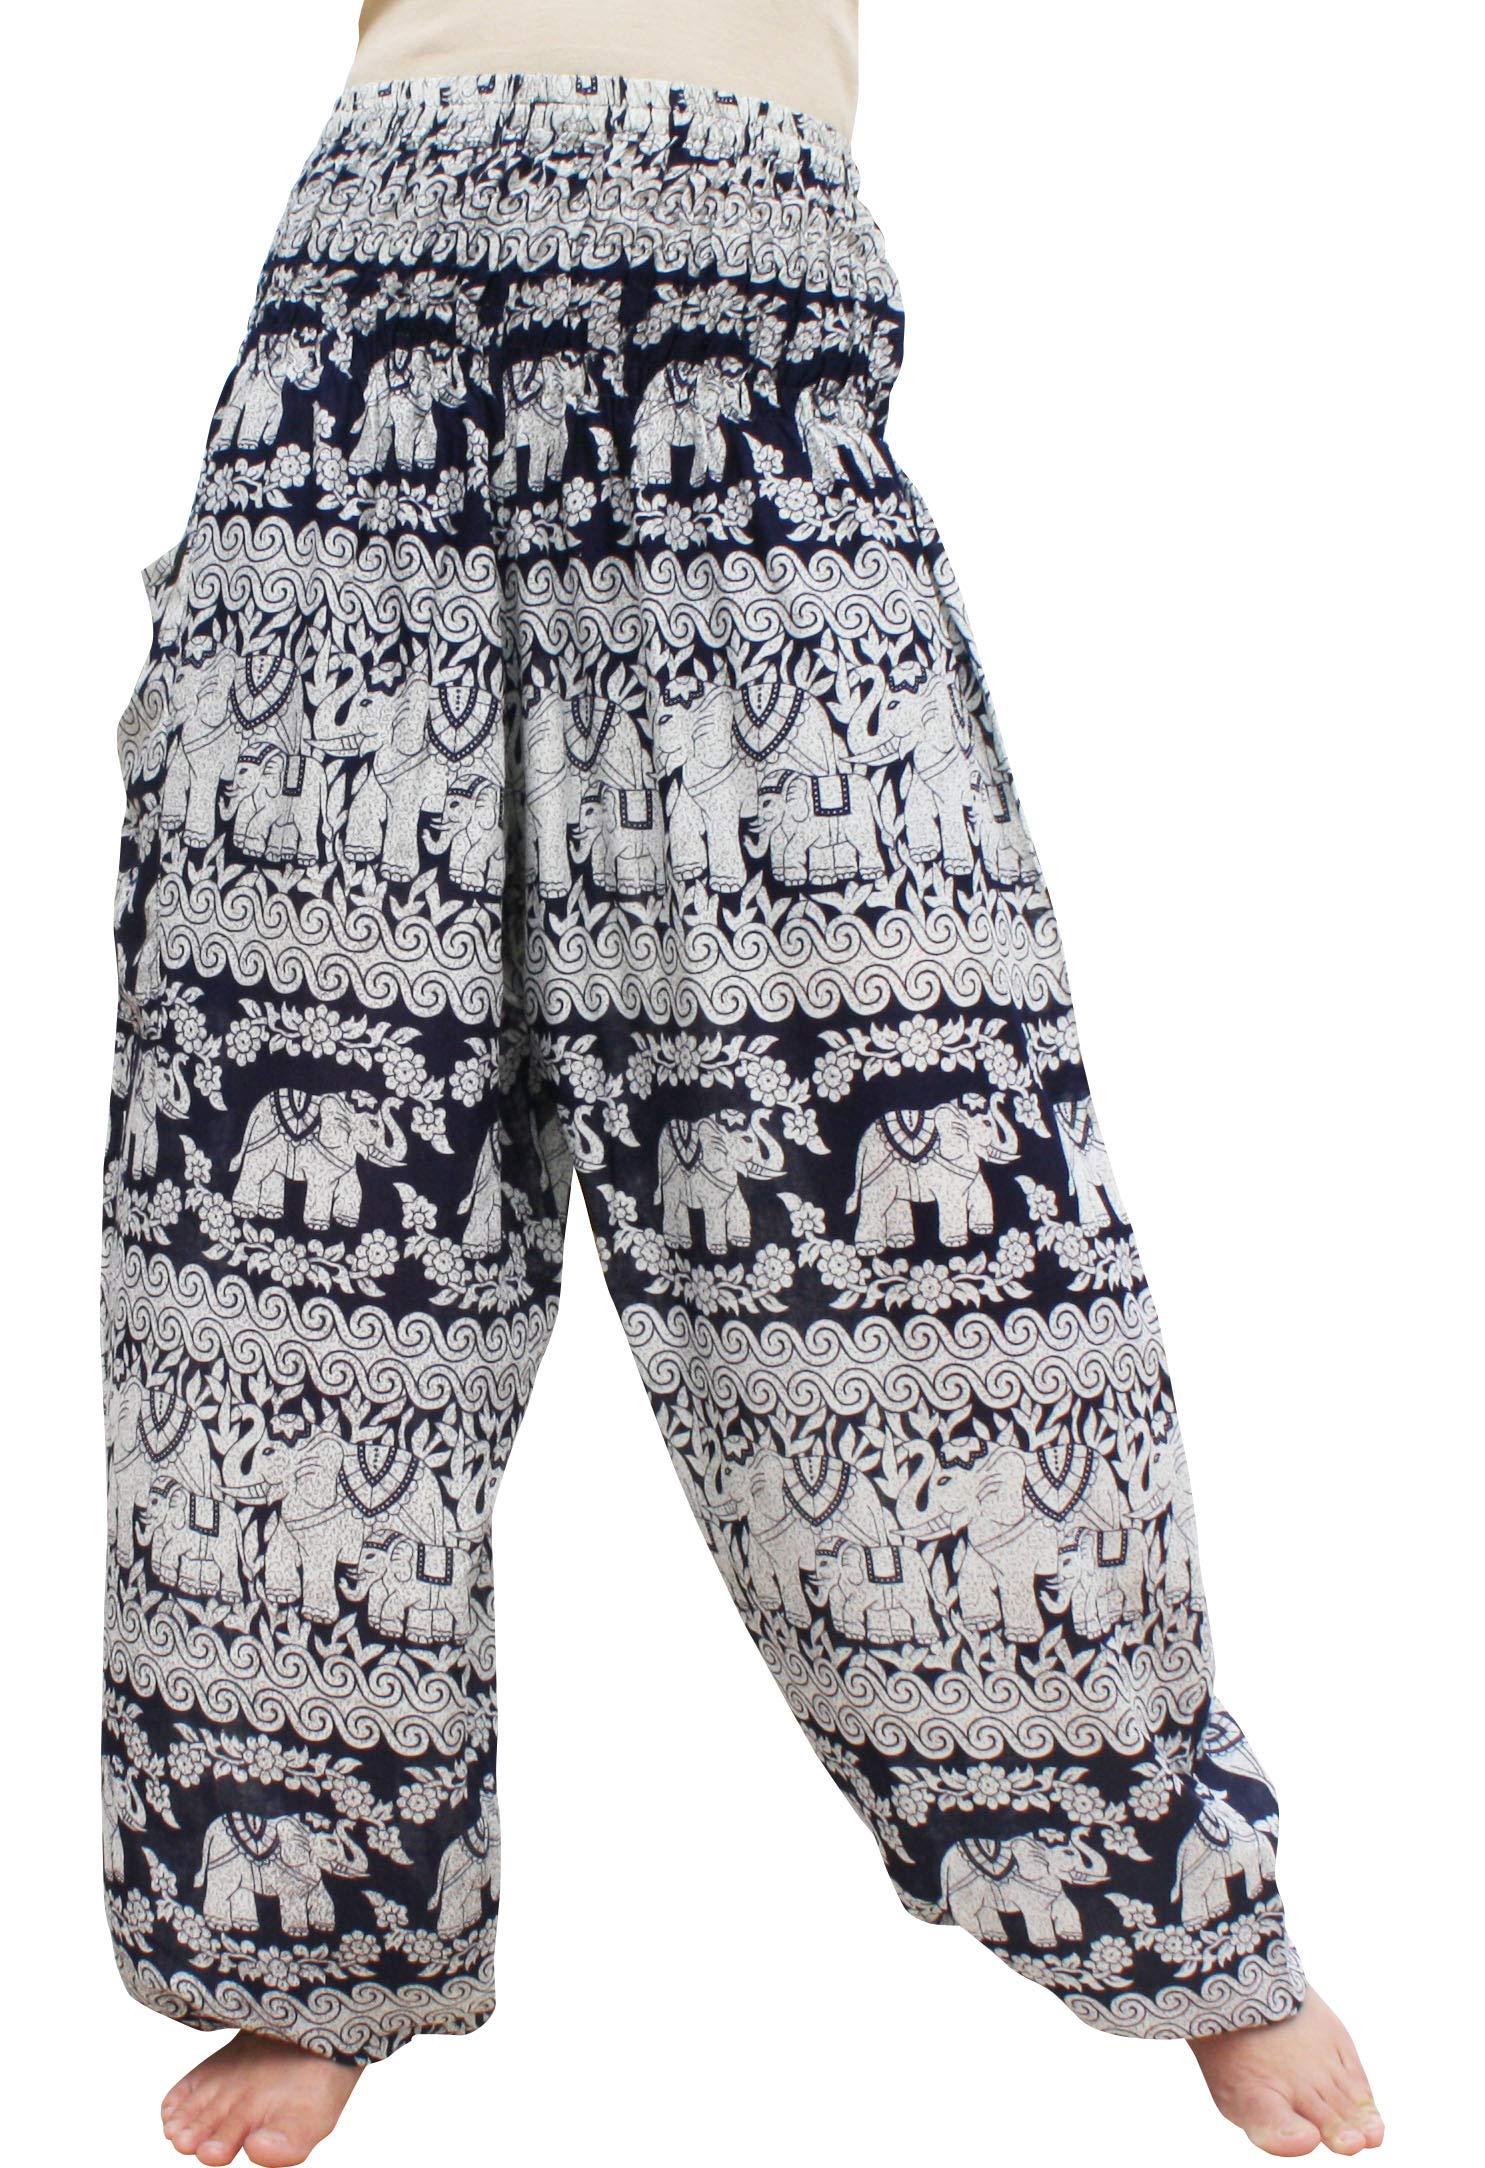 RaanPahMuang Brand Smock Waist Rayon Mixed Art Harem Baggy Aladdin Pants, Large, Elephant - Midnight Blue by RaanPahMuang